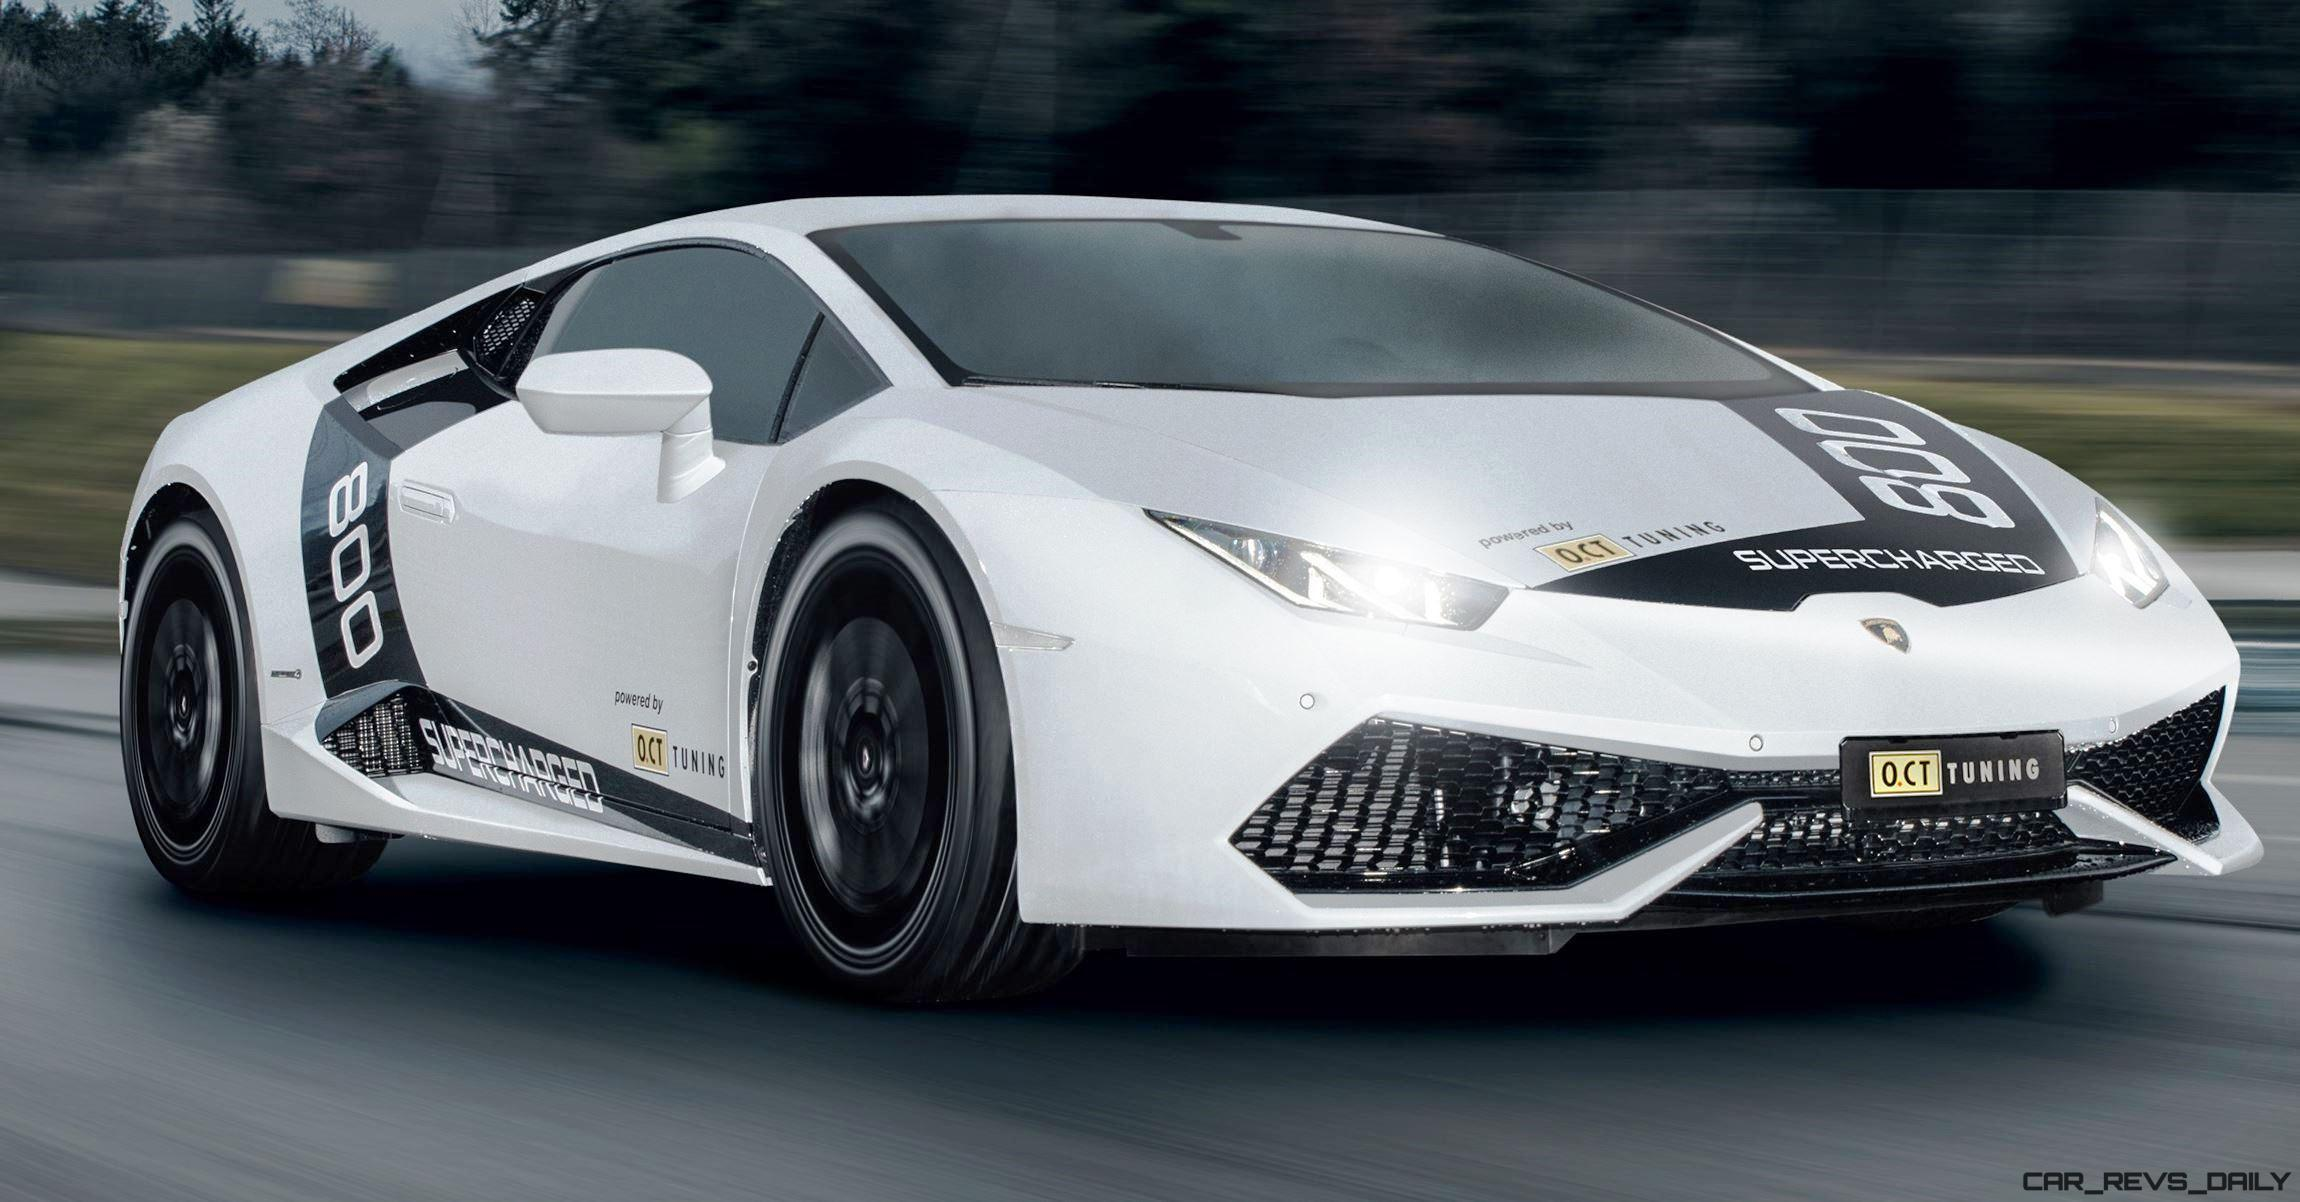 OCT-Huracan-7 Extraordinary Lamborghini Huracan Need for Speed Cars Trend